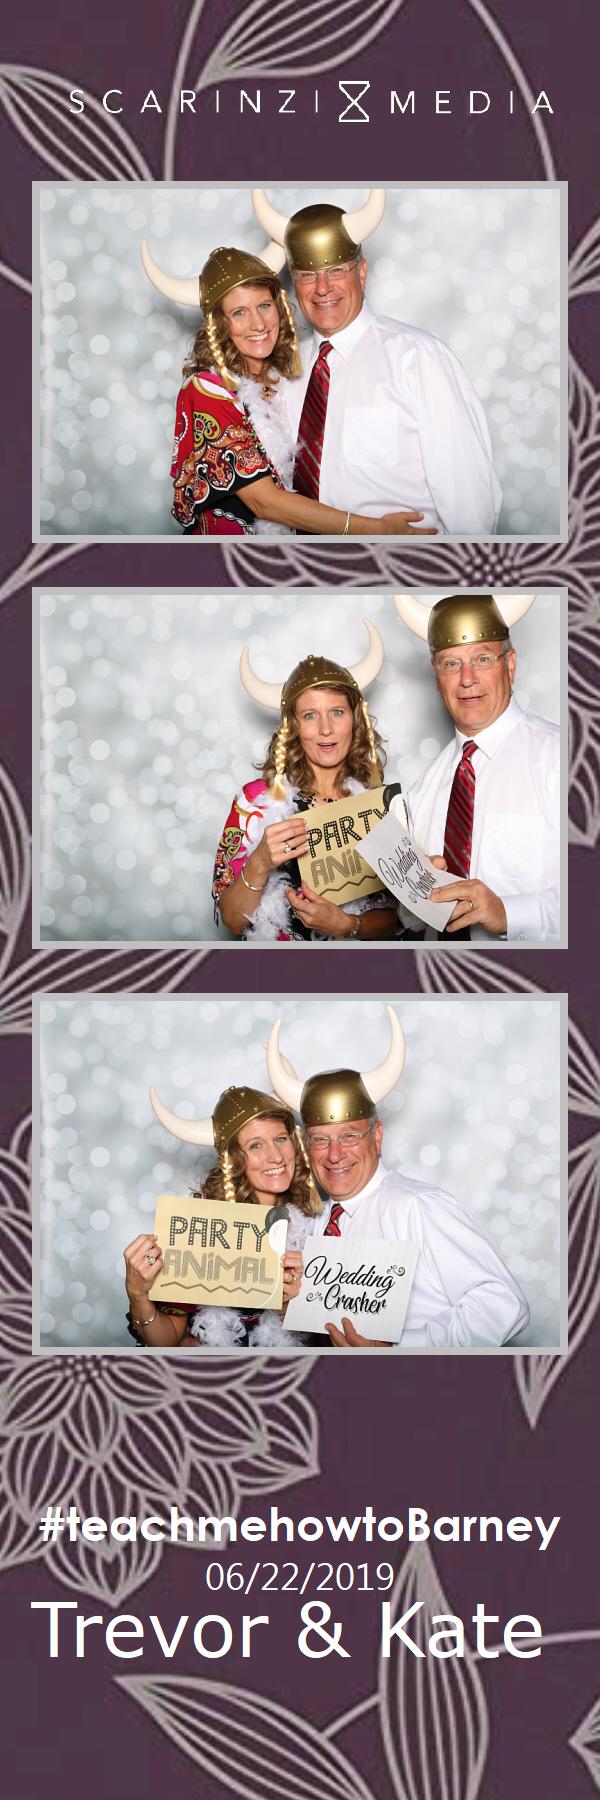 2019.06.22 - Barney Wedding PHOTOBOOTH18.jpg